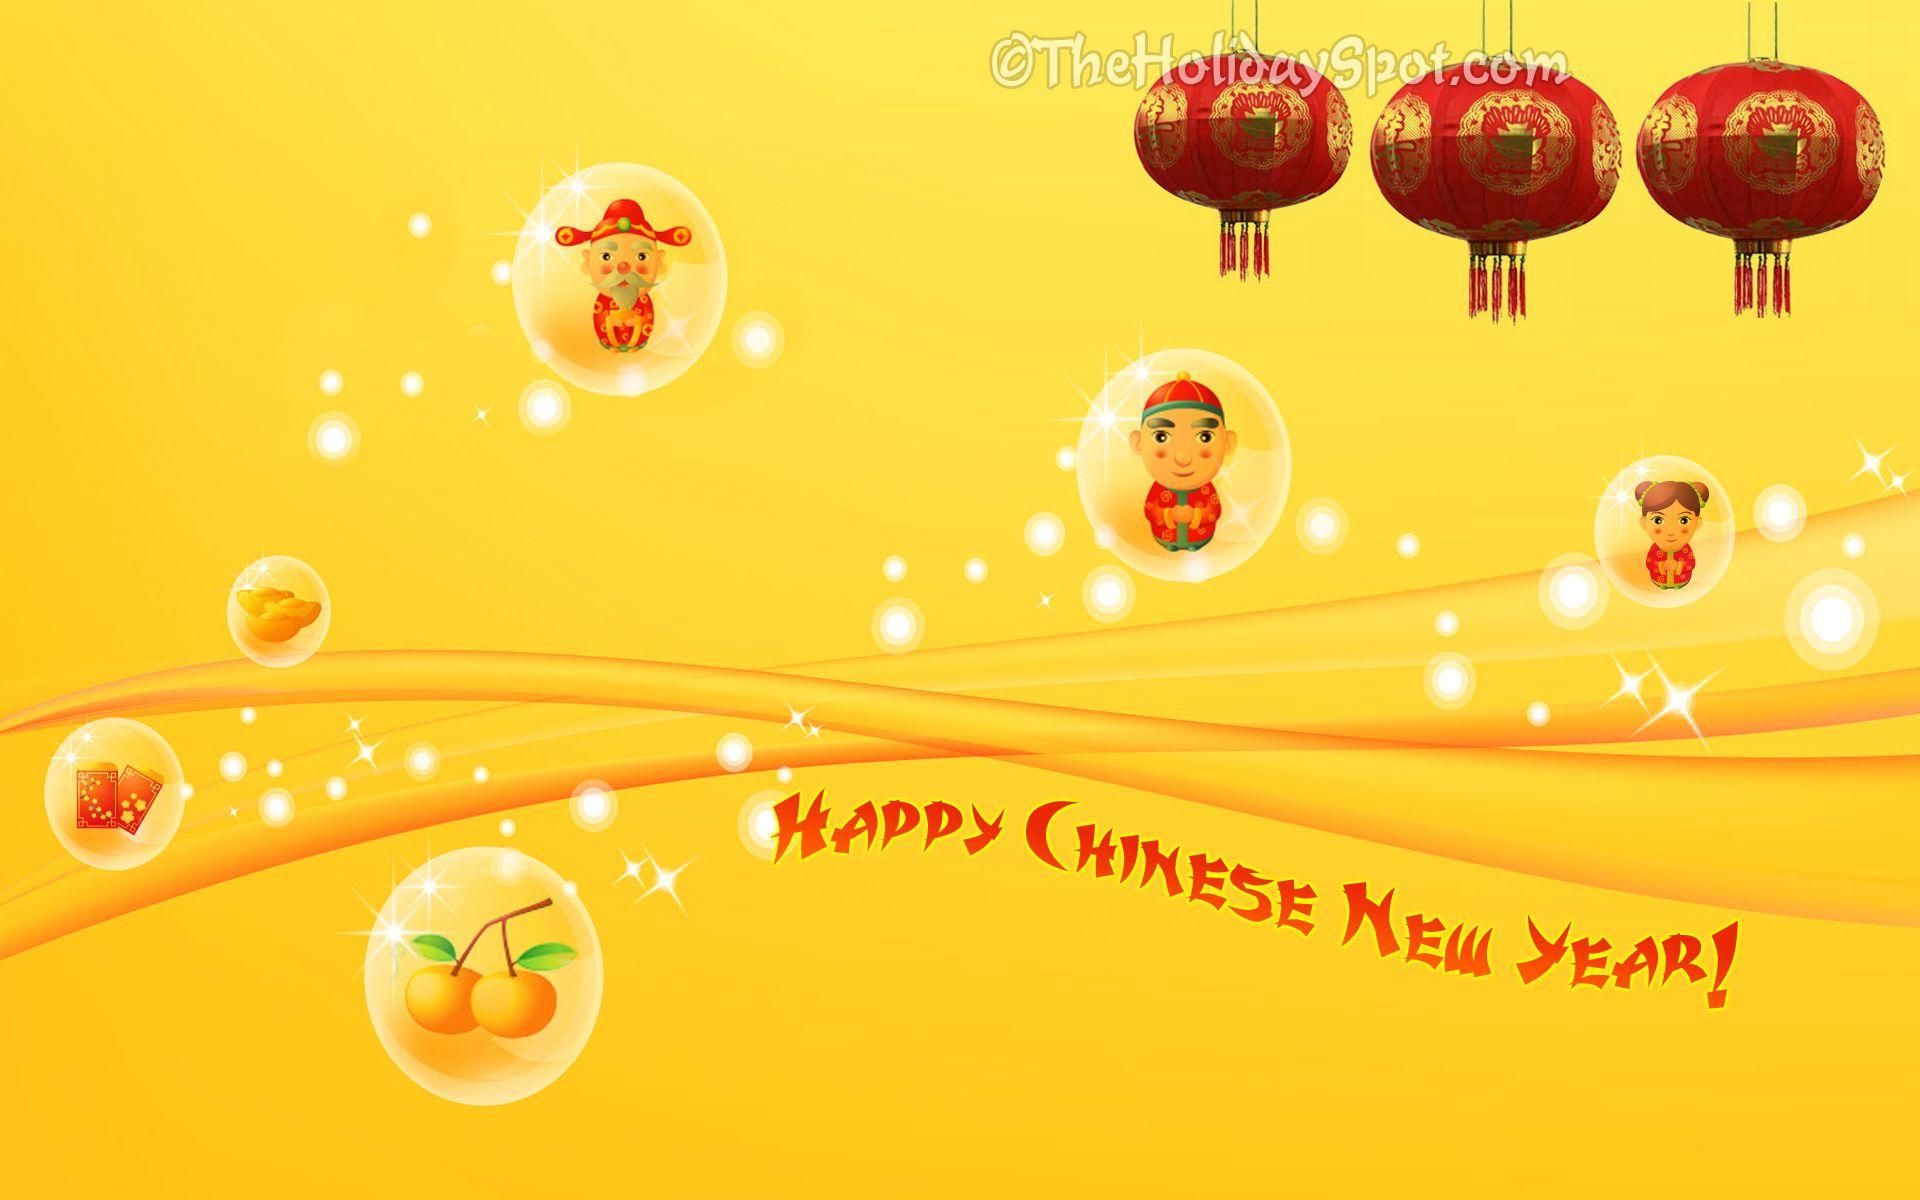 Cute chinese new year wallpaper for desktop chinese new year cute chinese new year wallpaper for desktop kristyandbryce Gallery